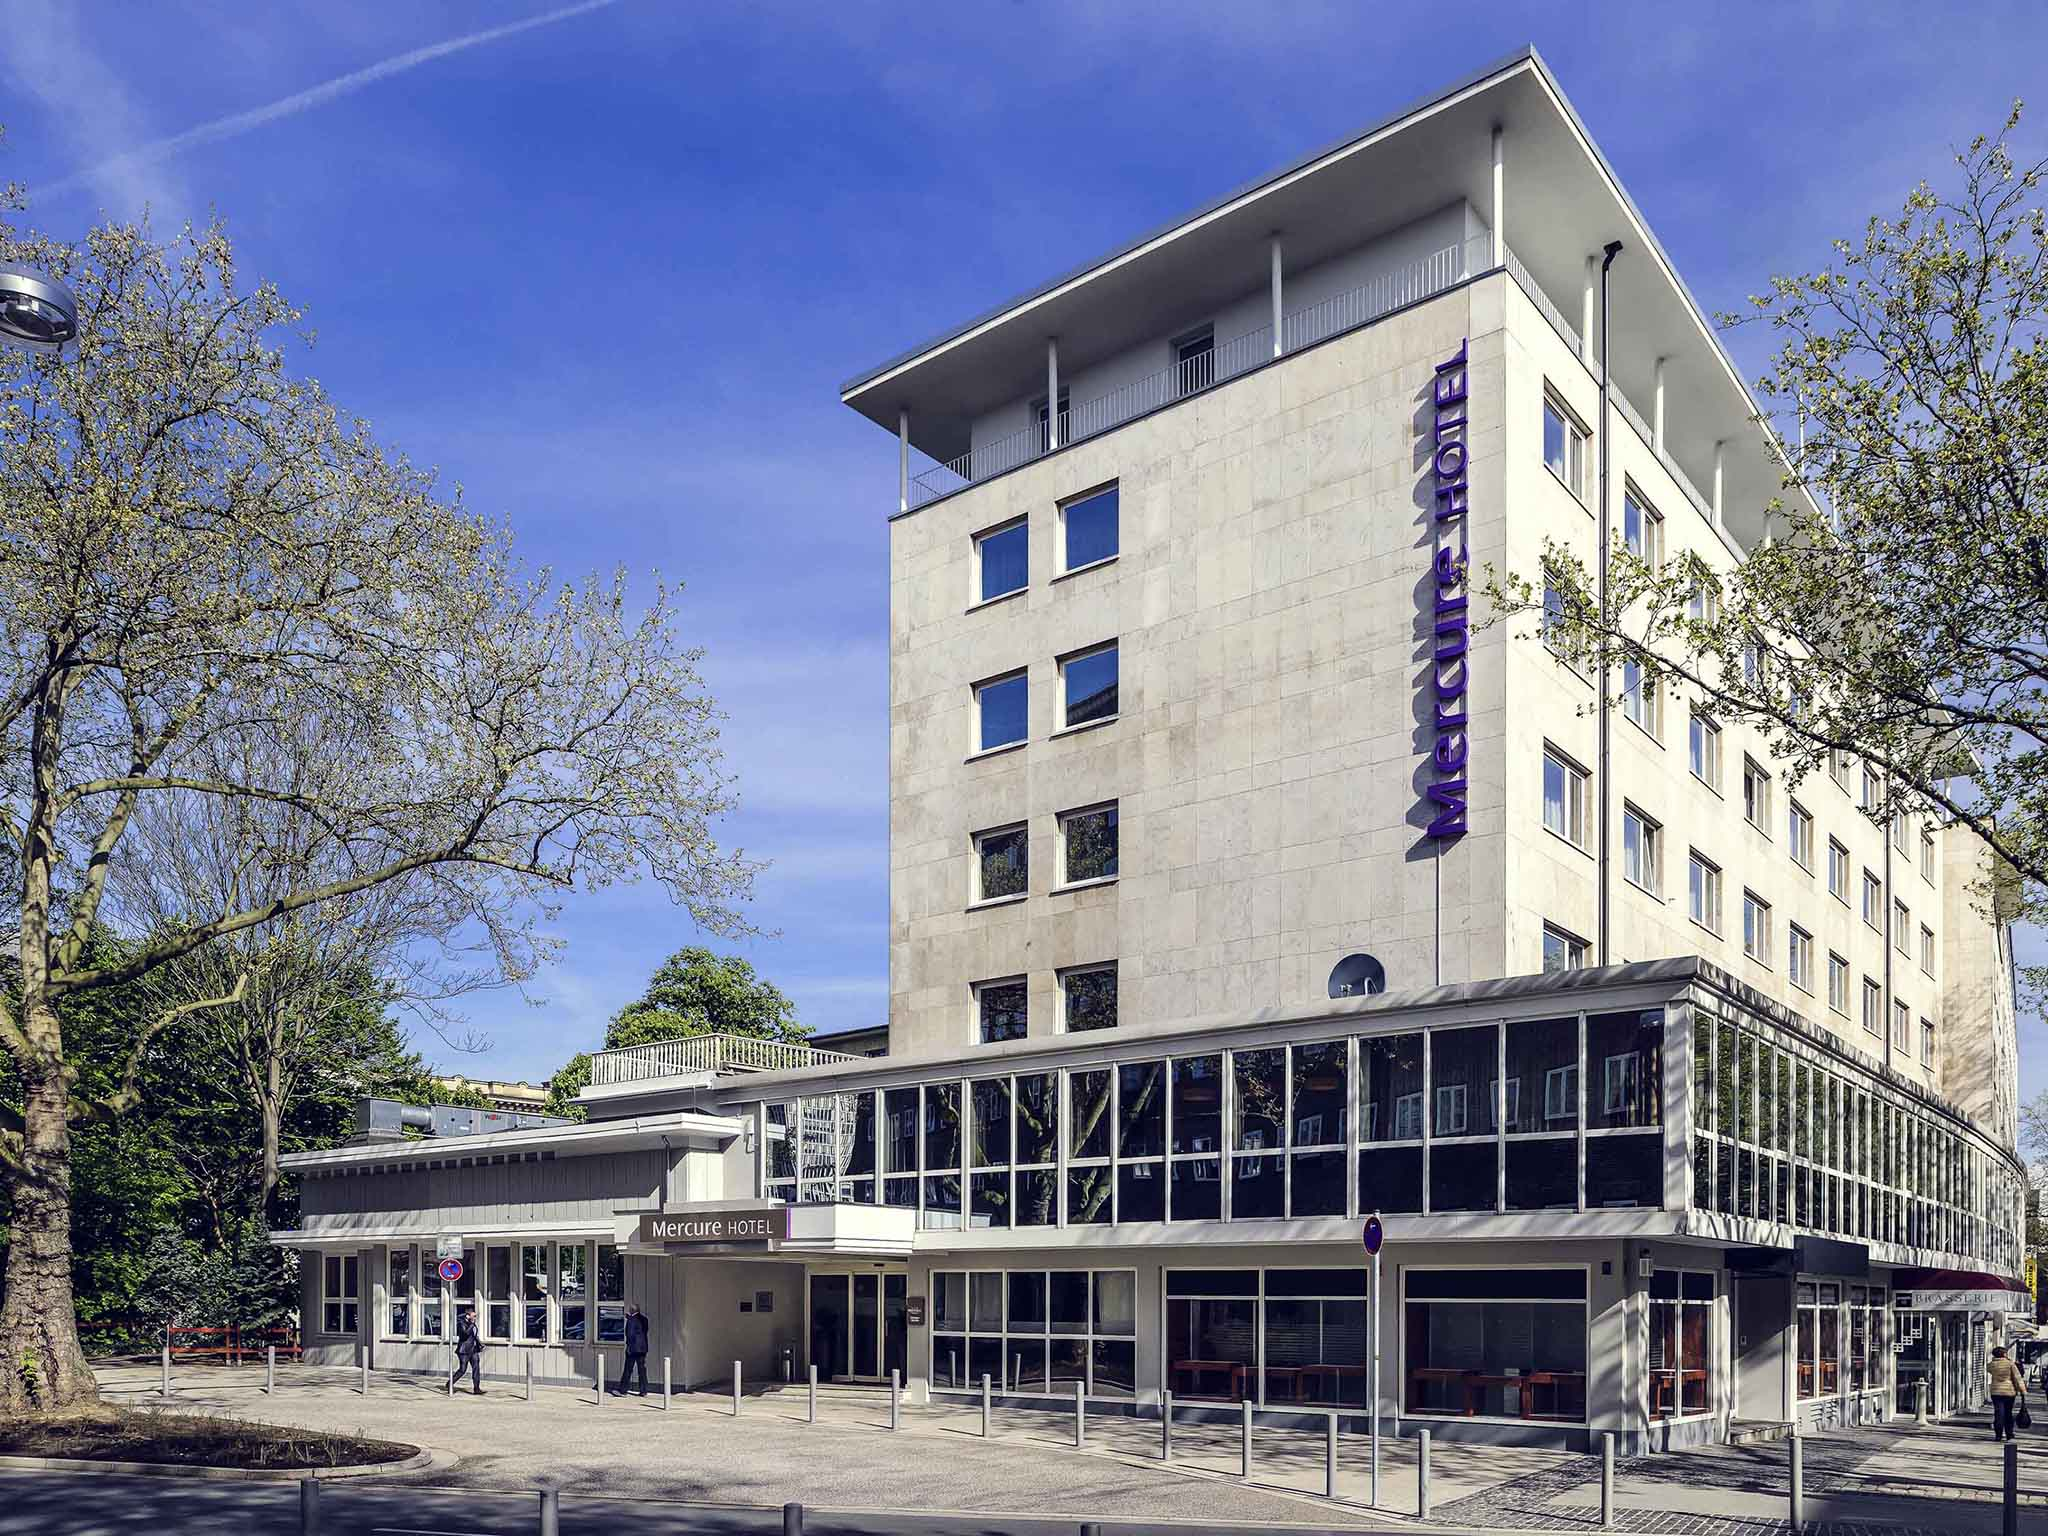 Hotel - Mercure Hotel Dortmund Centrum